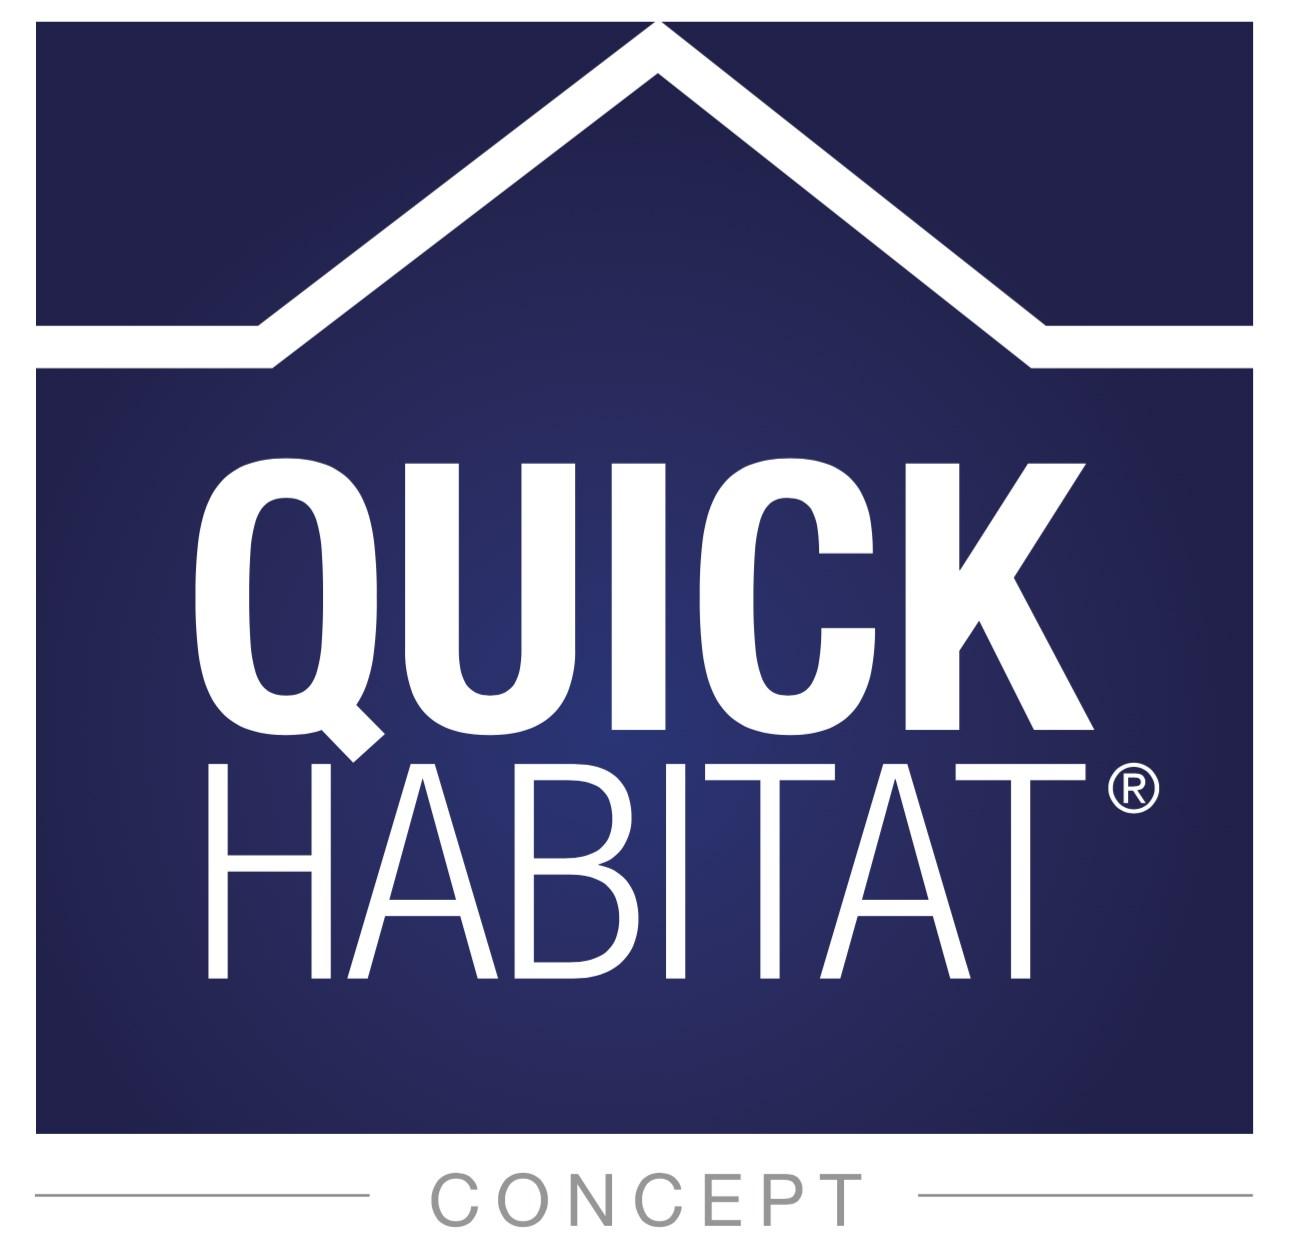 Avis Maison Habitat Concept quick habitat à melun